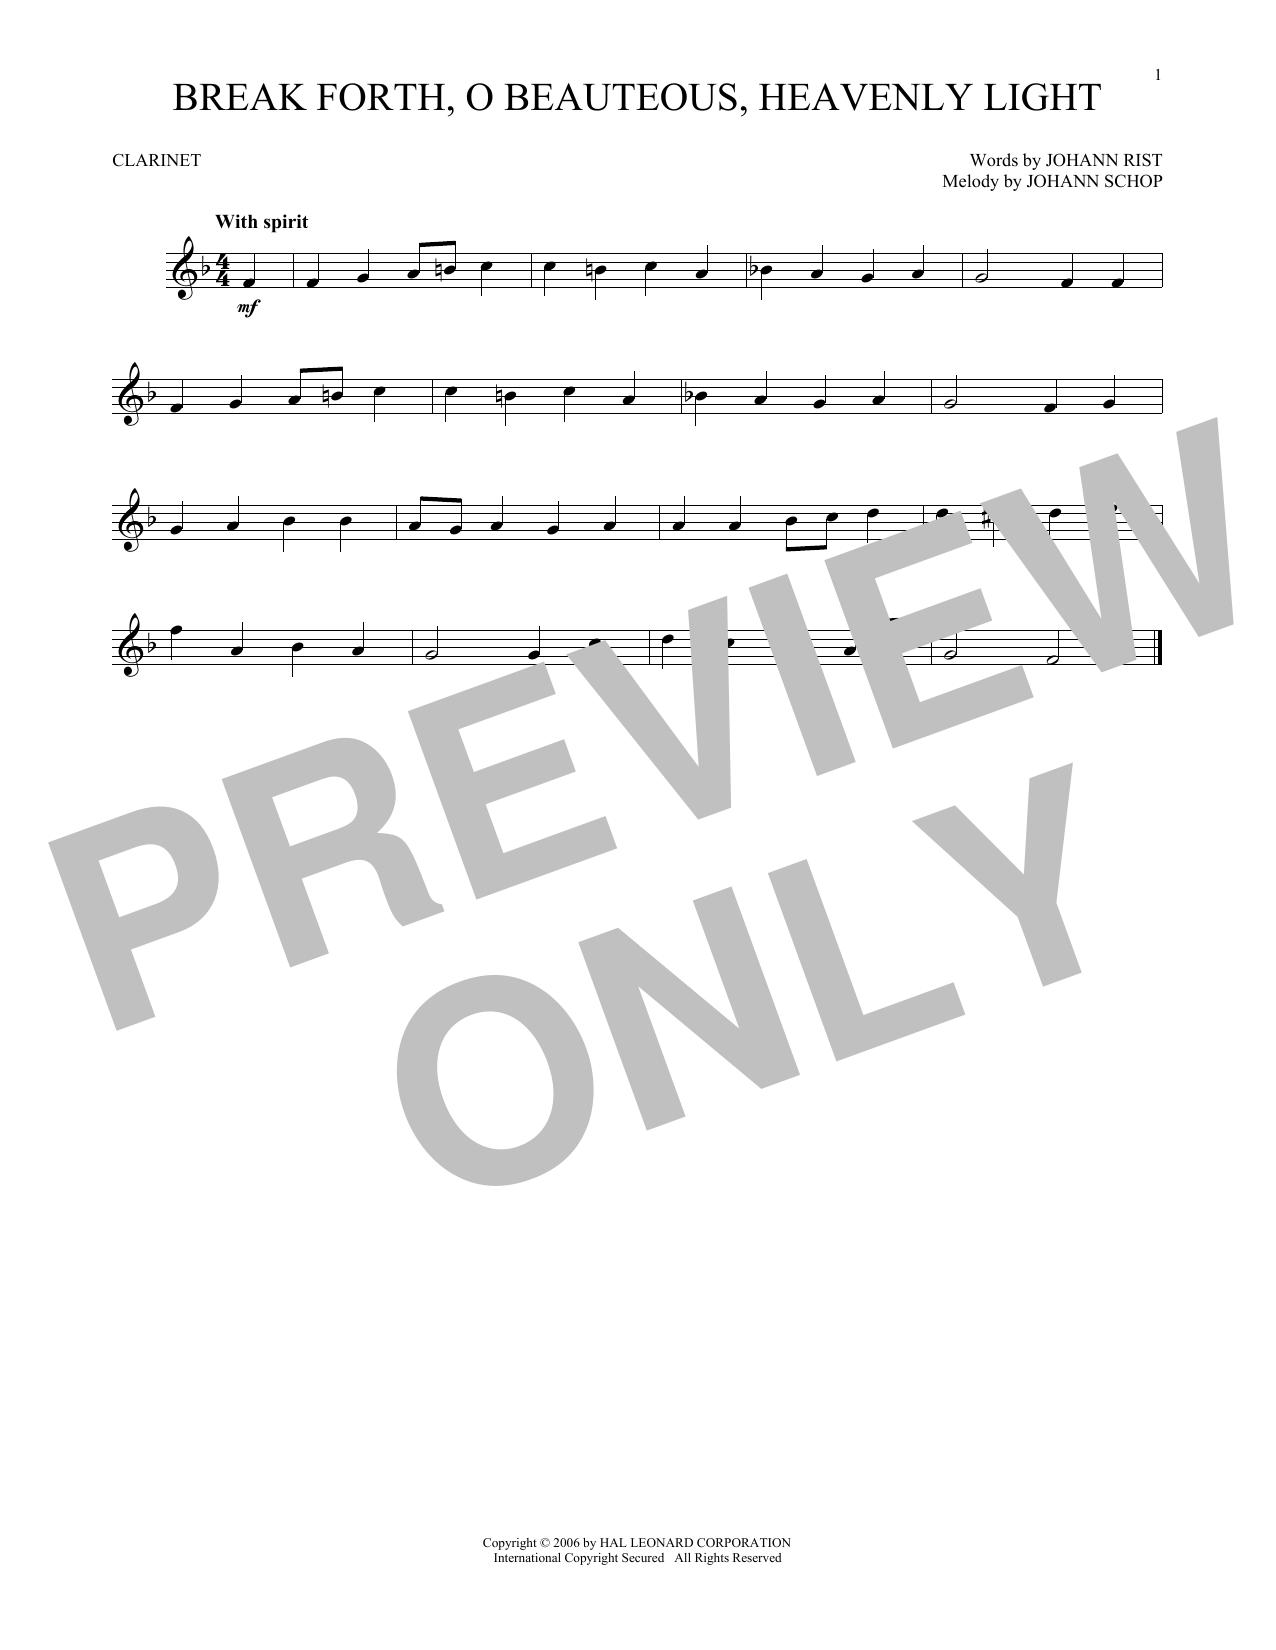 Break Forth, O Beauteous, Heavenly Light (Clarinet Solo)